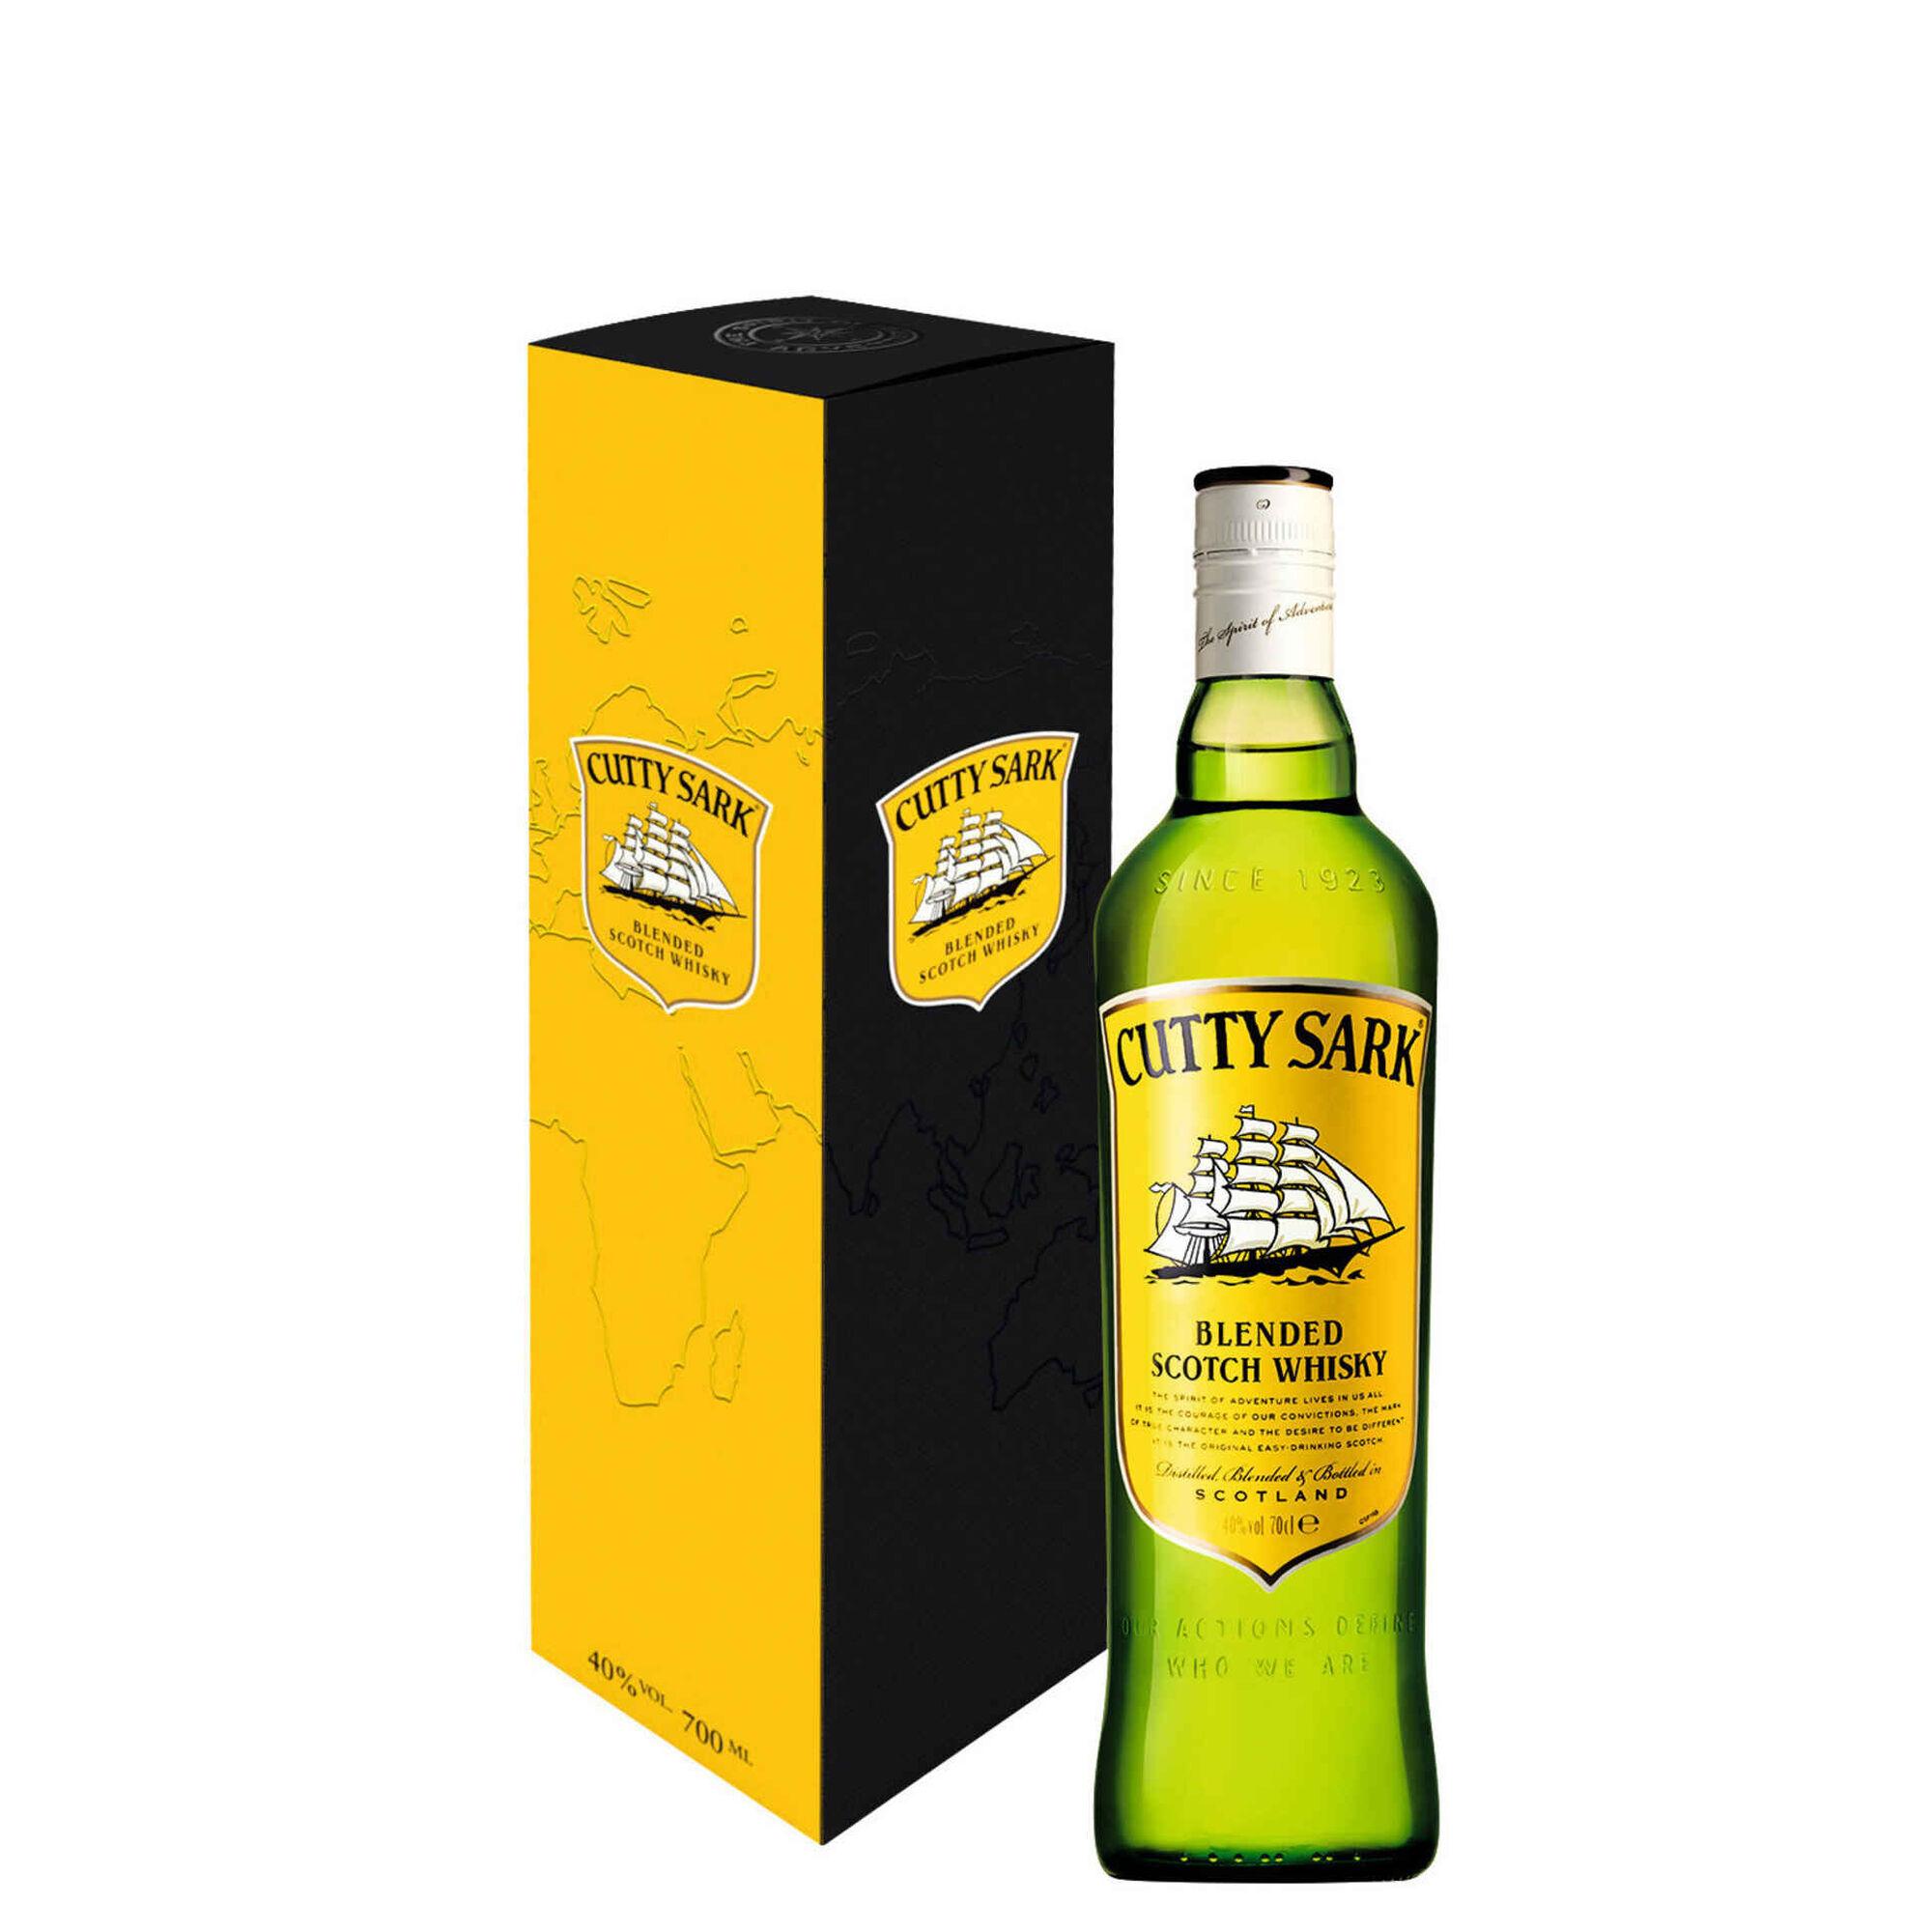 Whisky Scotch Cutty Sark